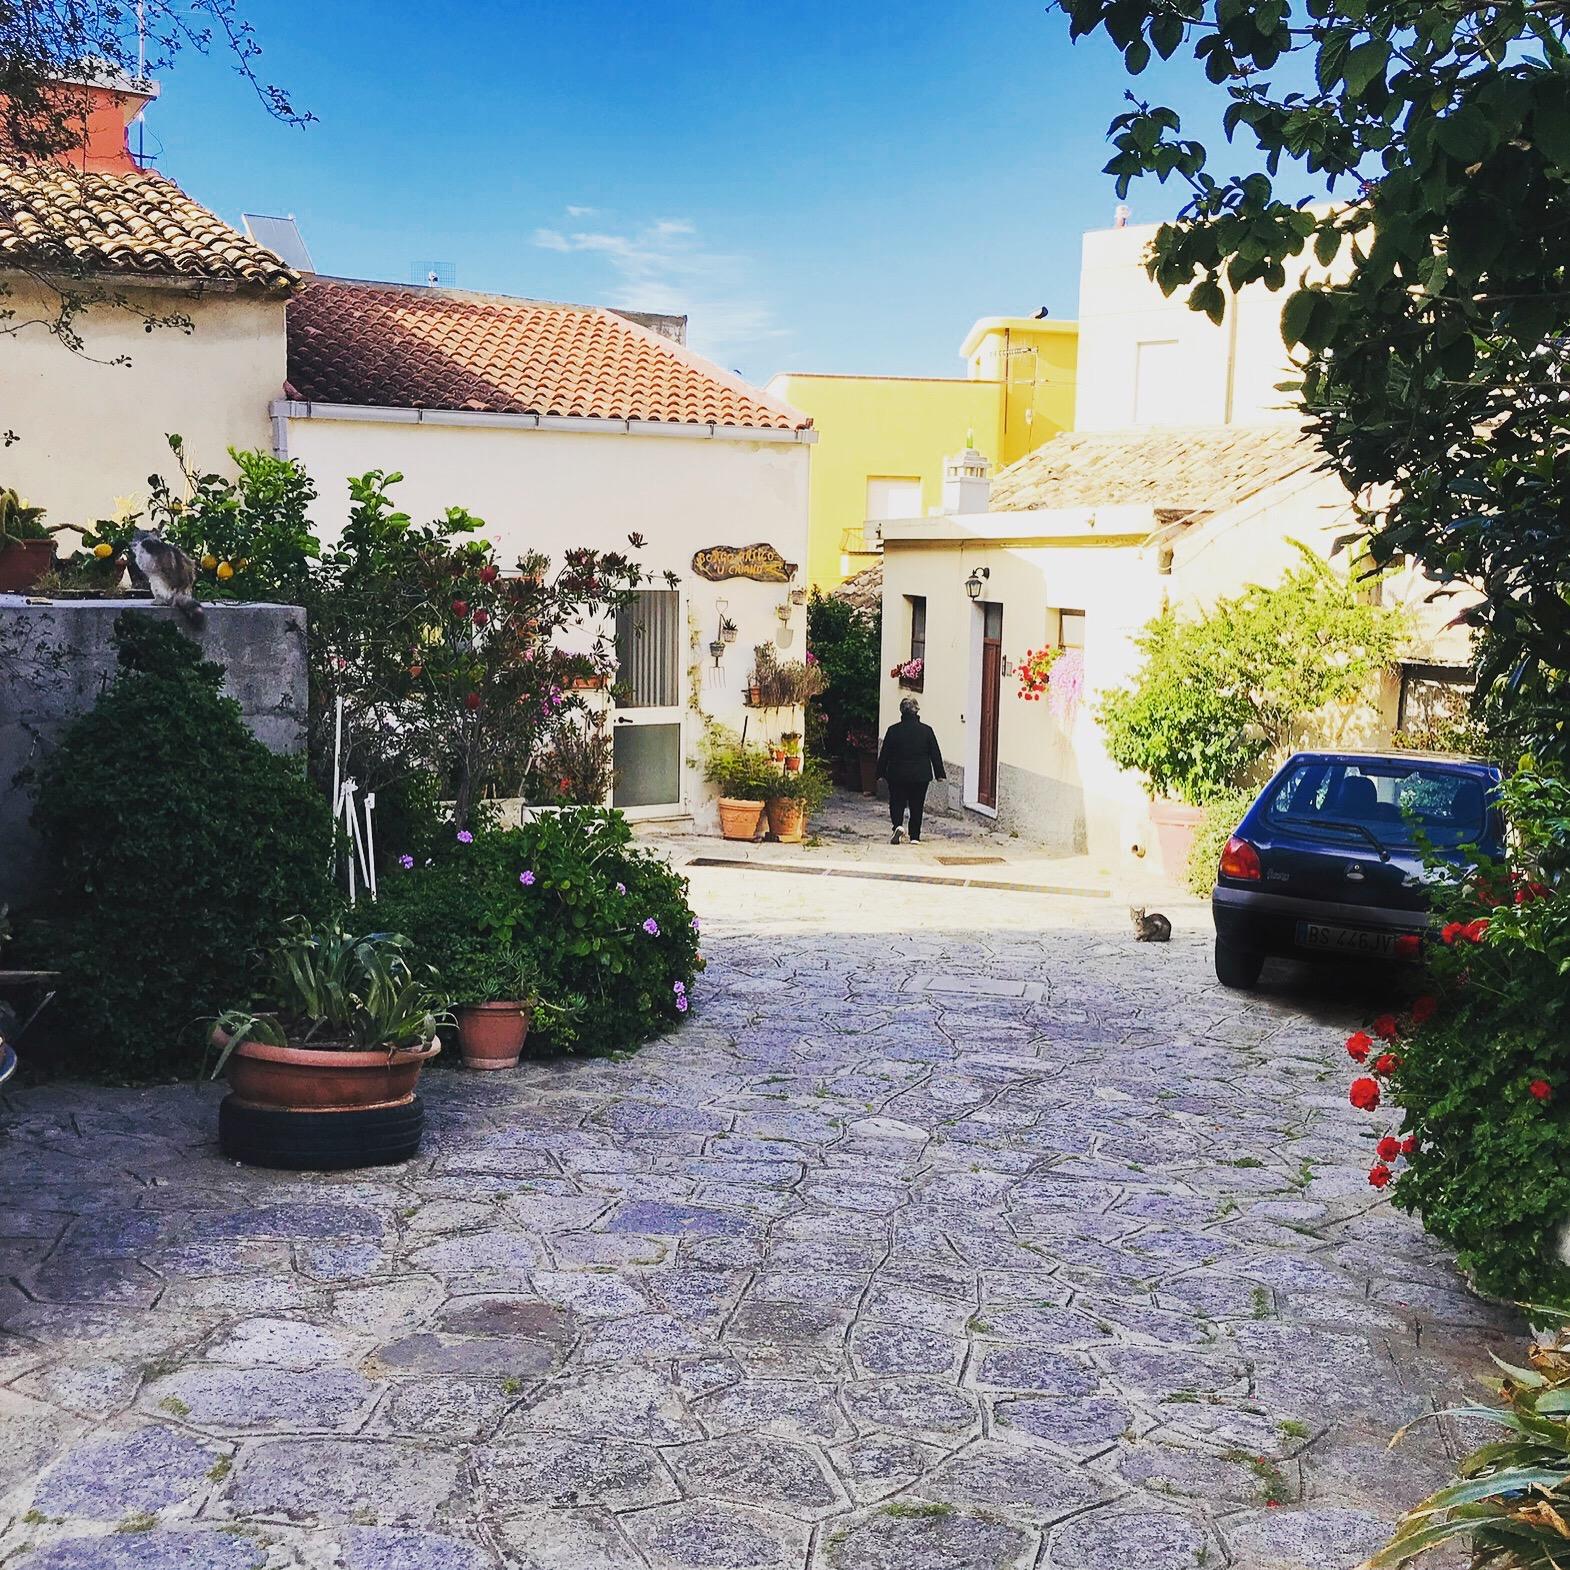 Centro storico Soverato Borgo